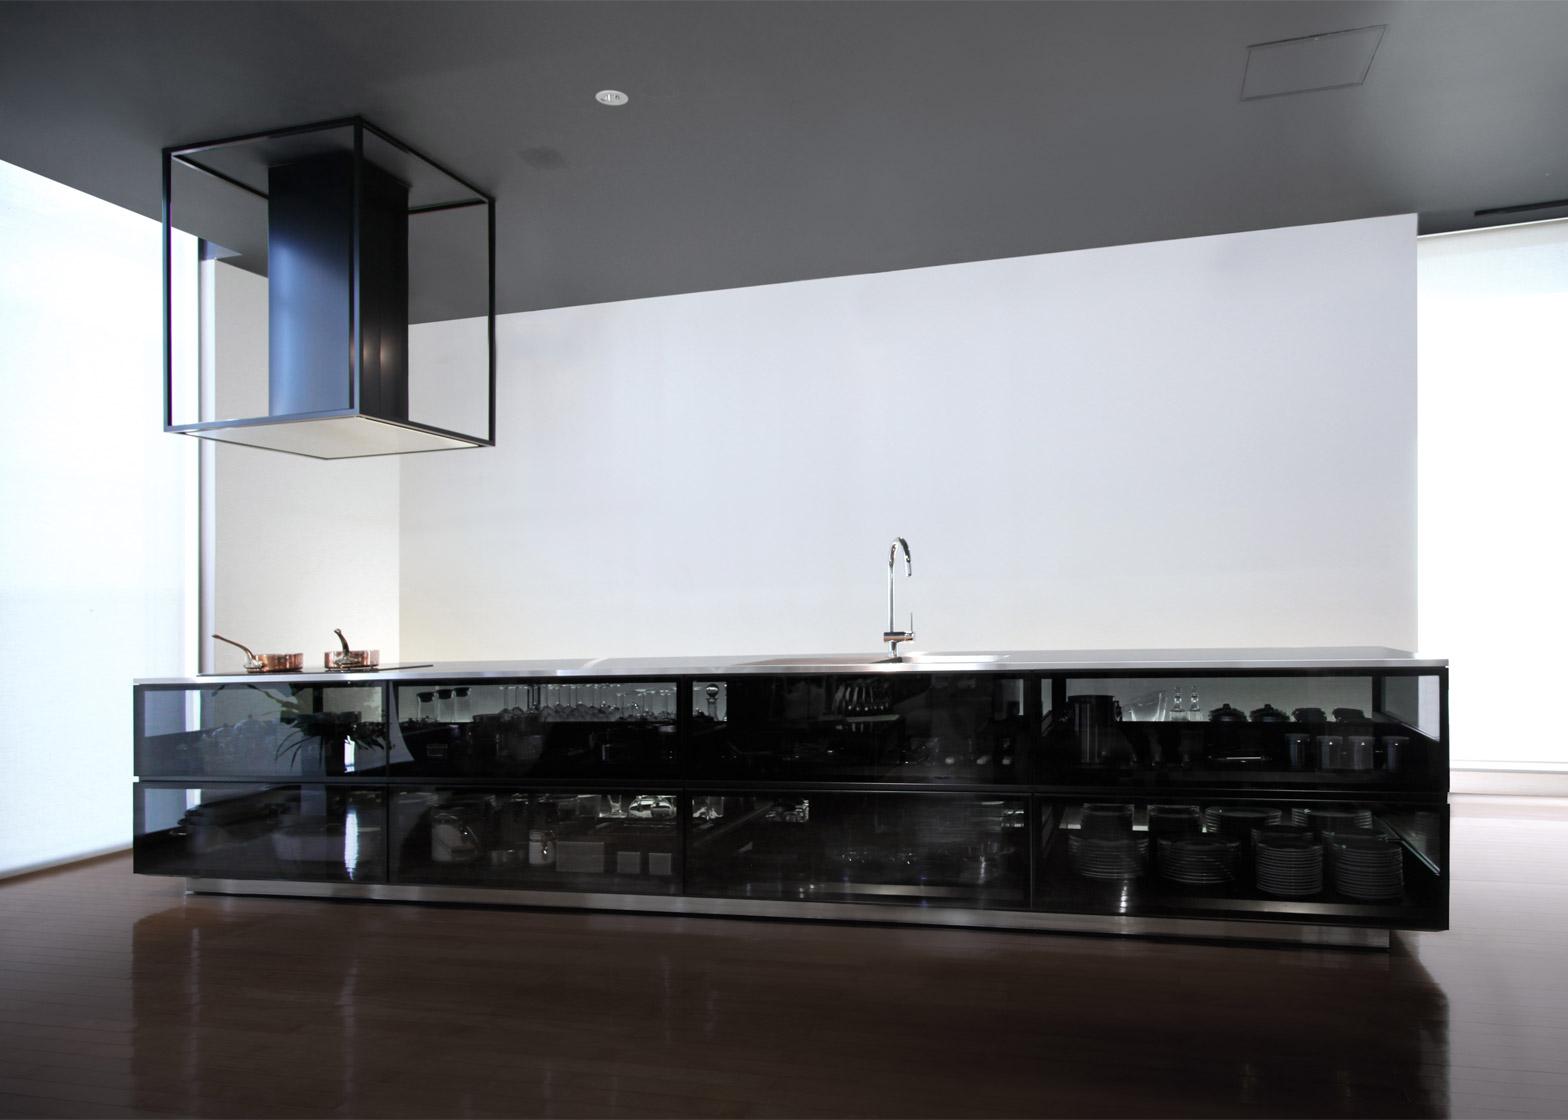 finesse_glass-kitchen_tokujin-yoshioka_dezeen_1568_5